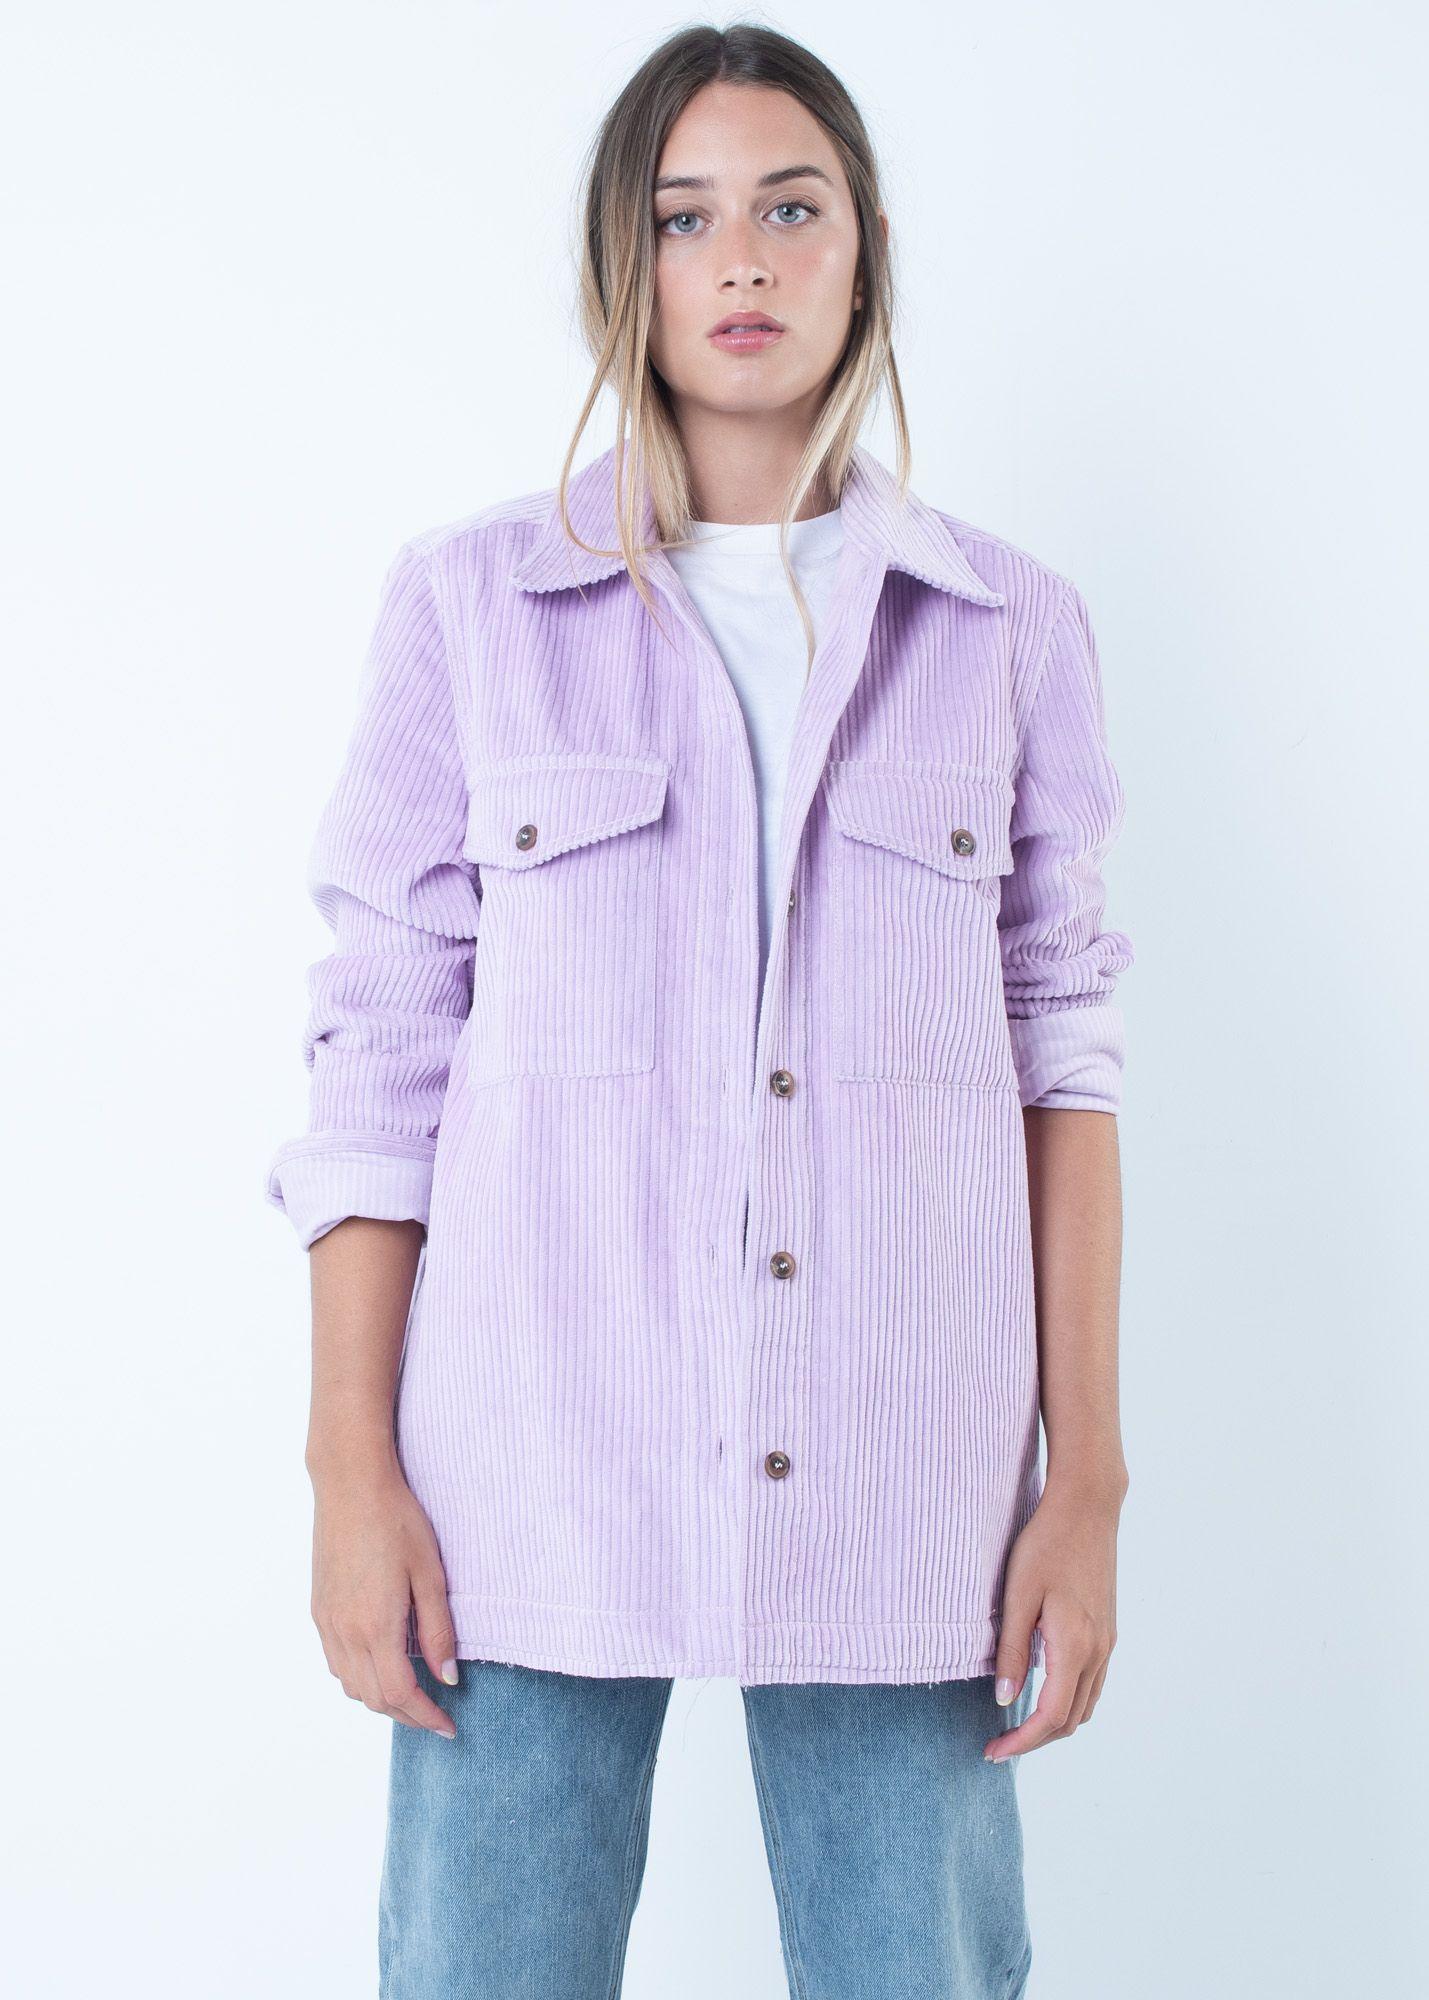 Lilac Corduroy Jacket